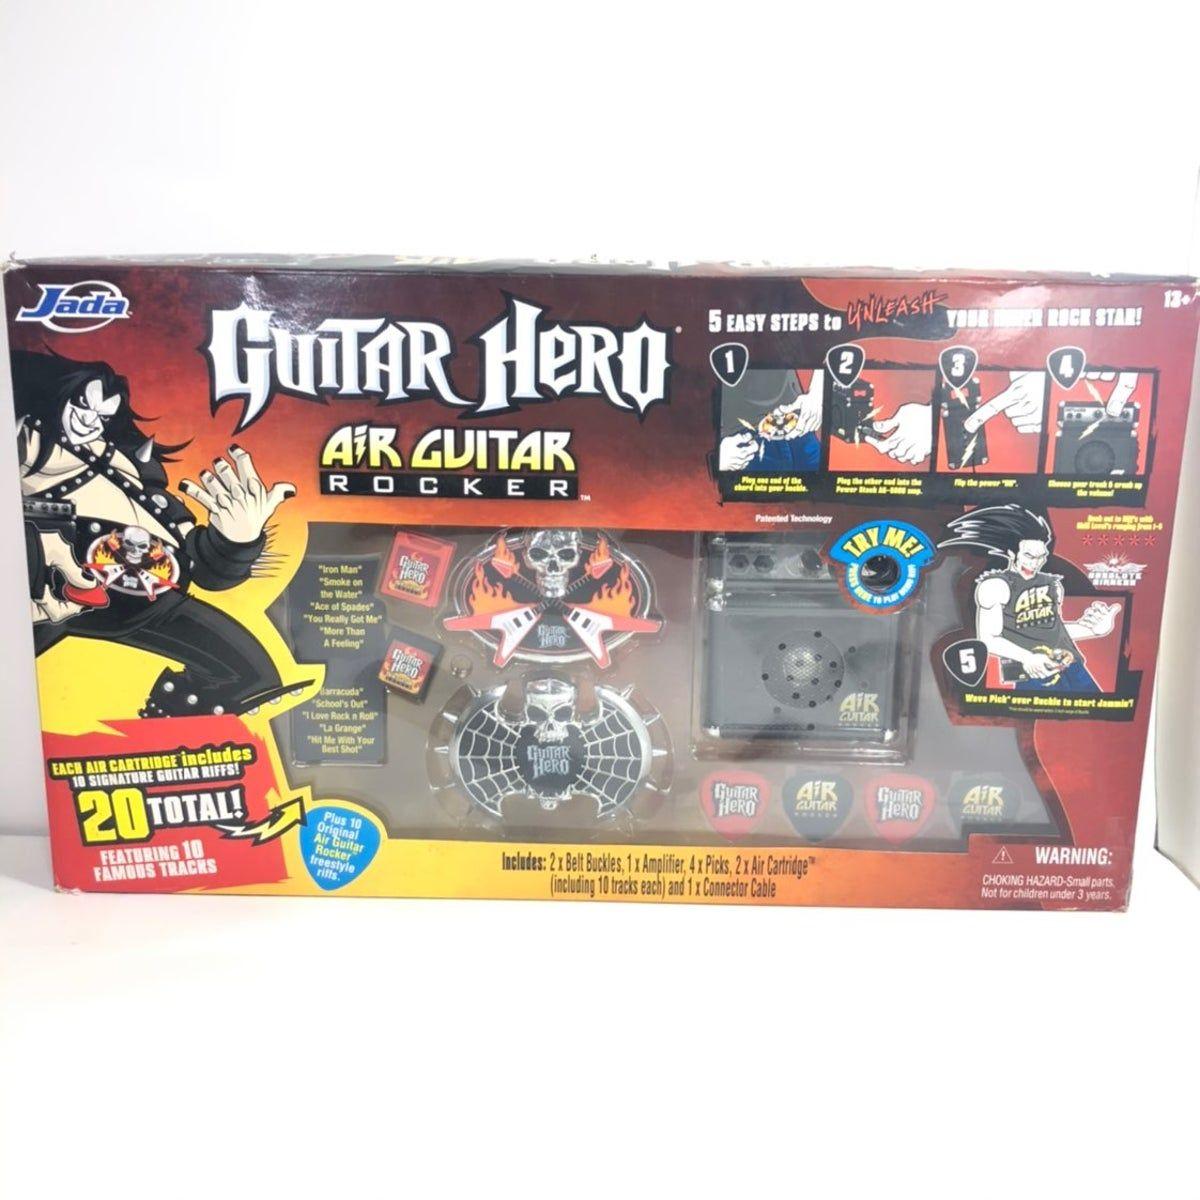 Guitar Hero Air Guitar Rocker Value Pack On Mercari Air Guitar Guitar Hero Rocker